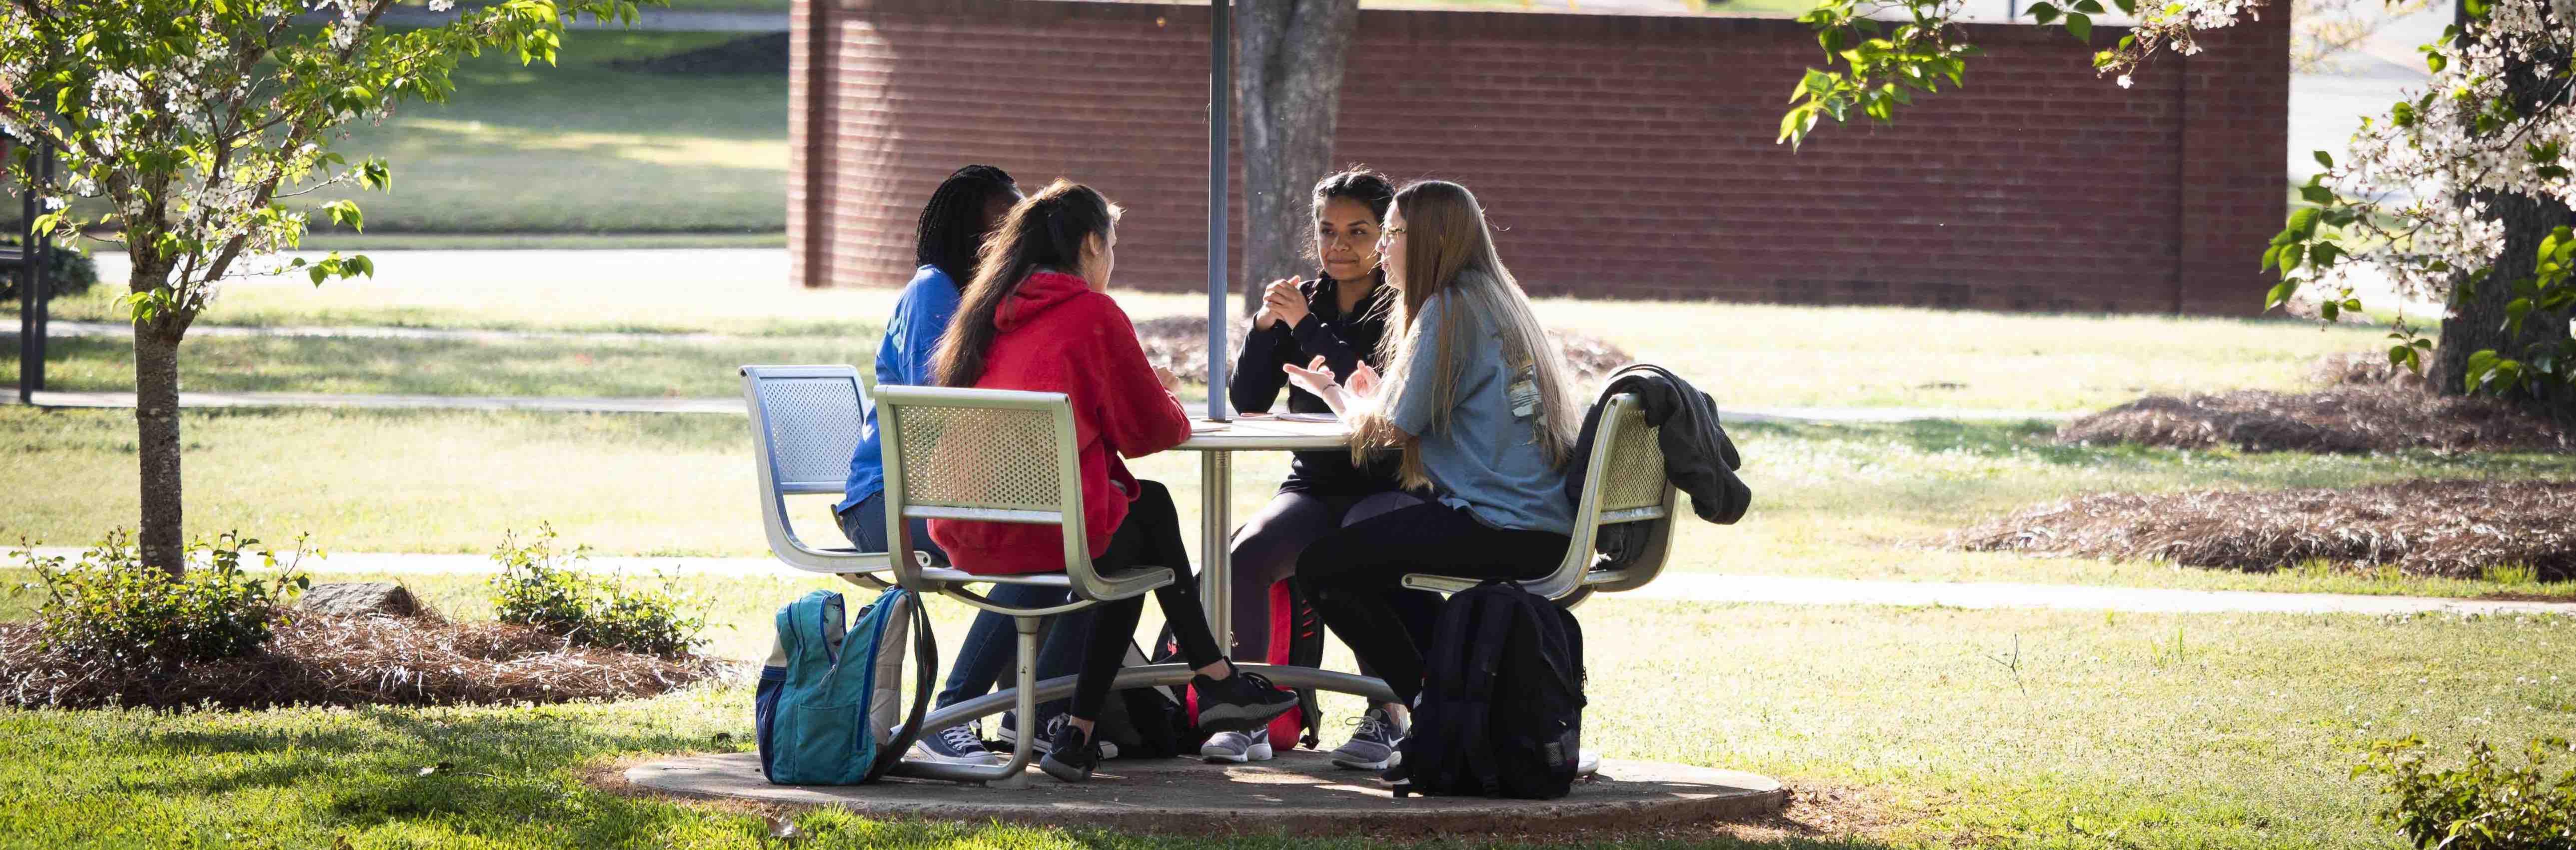 group-meeting-outdoor-table-c.jpg